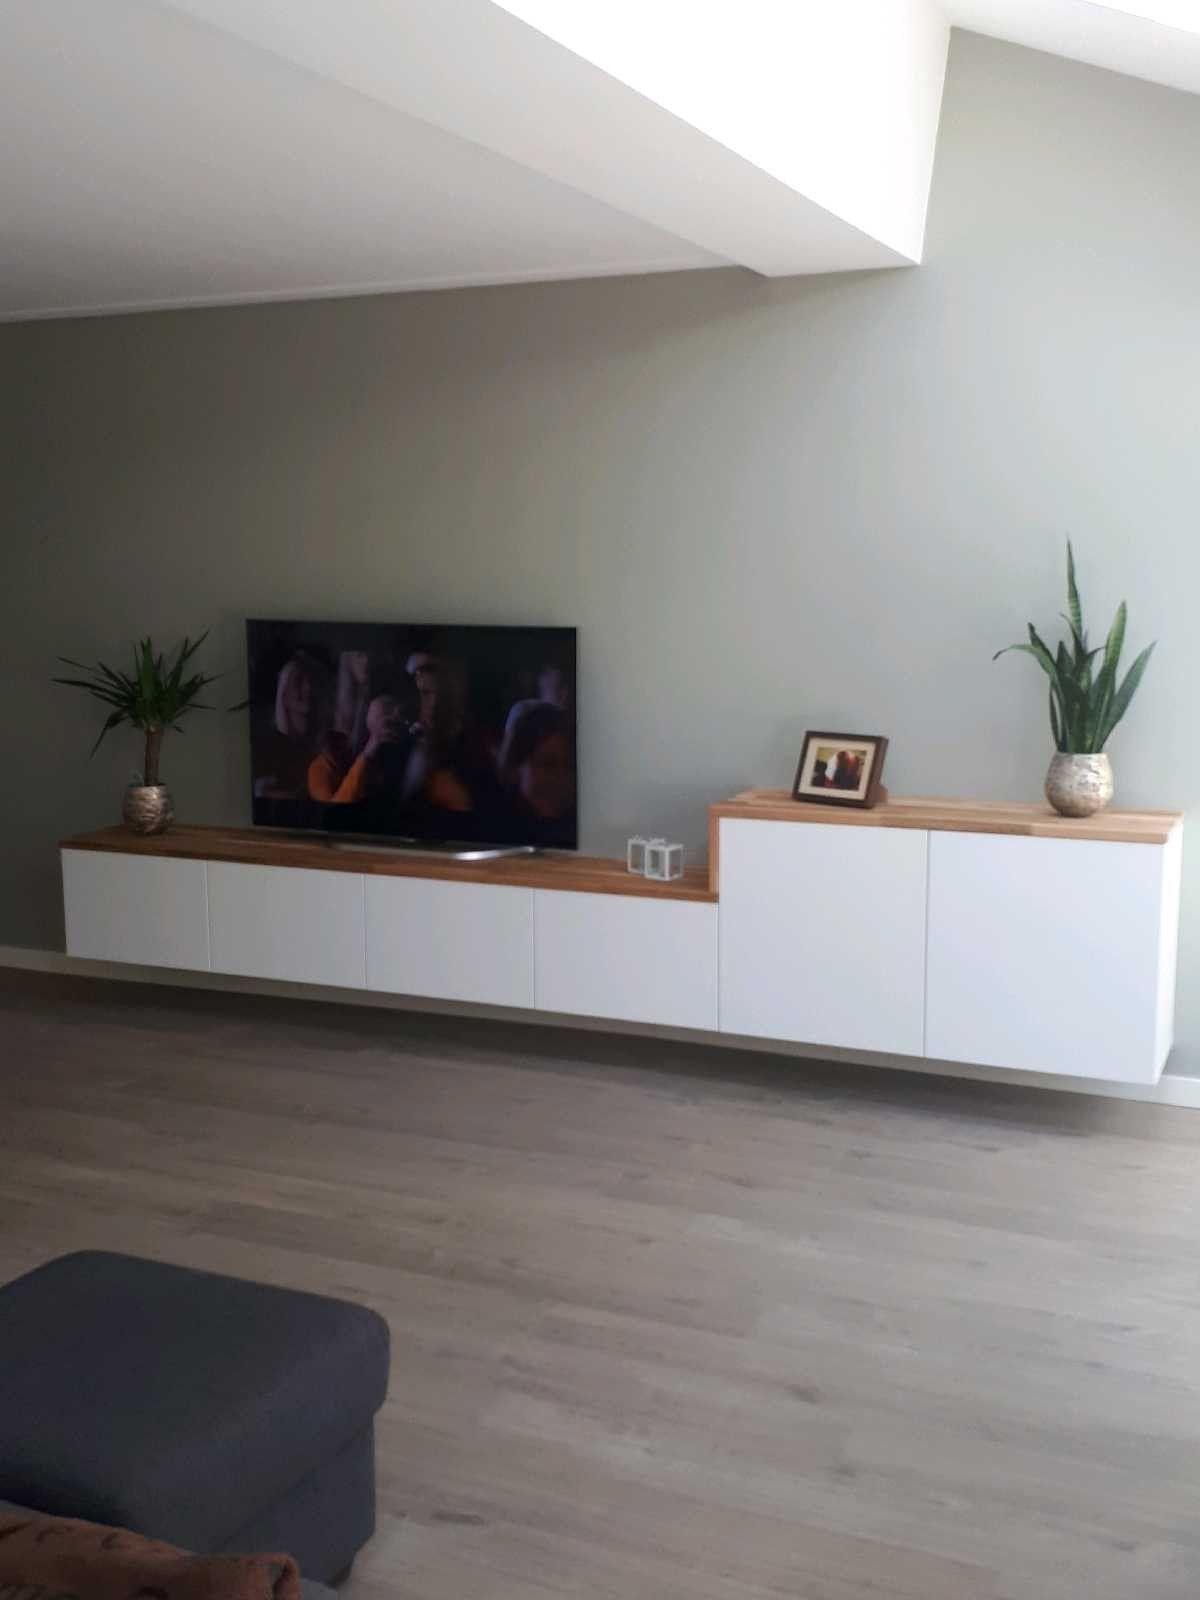 Expedit Tv Kast.Boho Chic By Sapphire Living Interiors Daria Szymanska In 2020